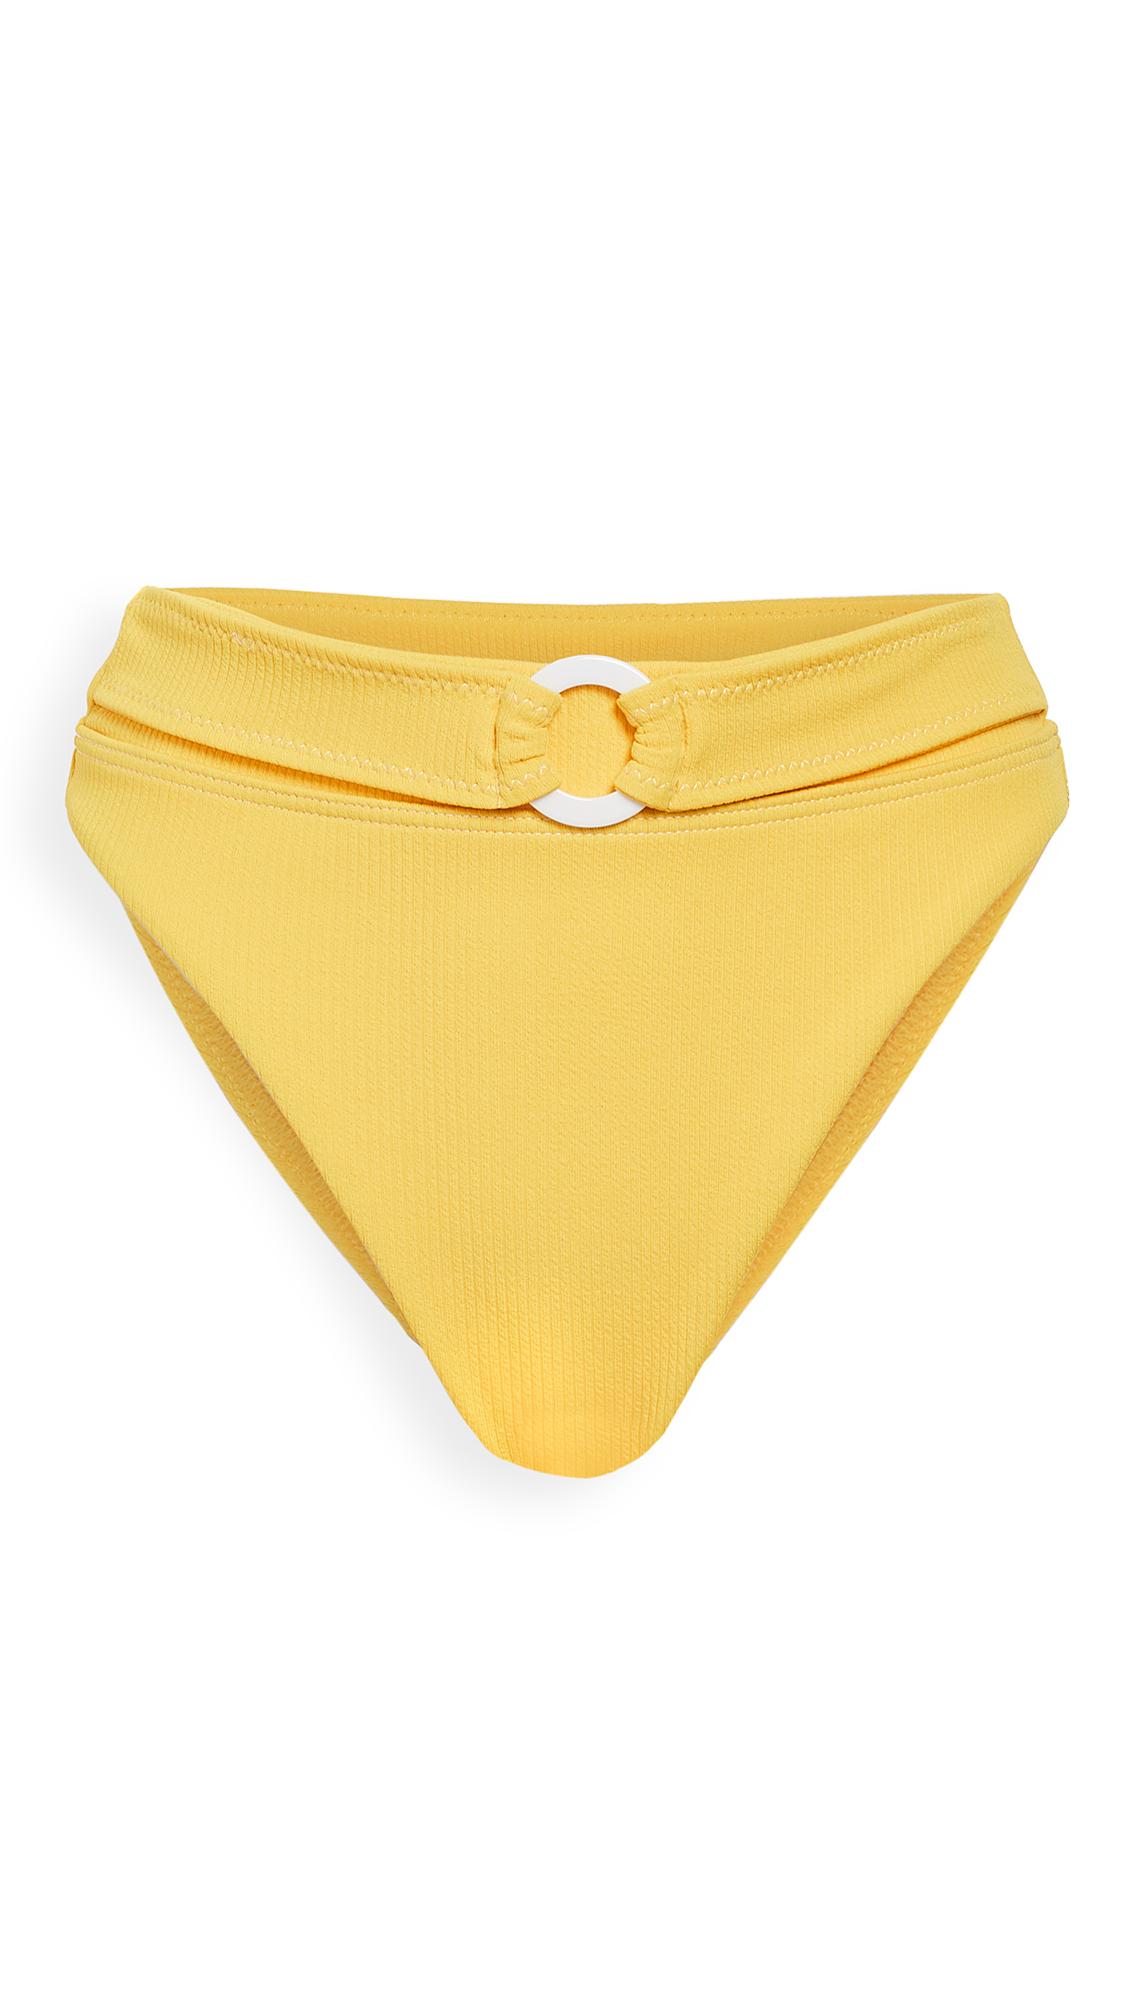 Suboo Ines Belted High Cut Bikini Bottoms